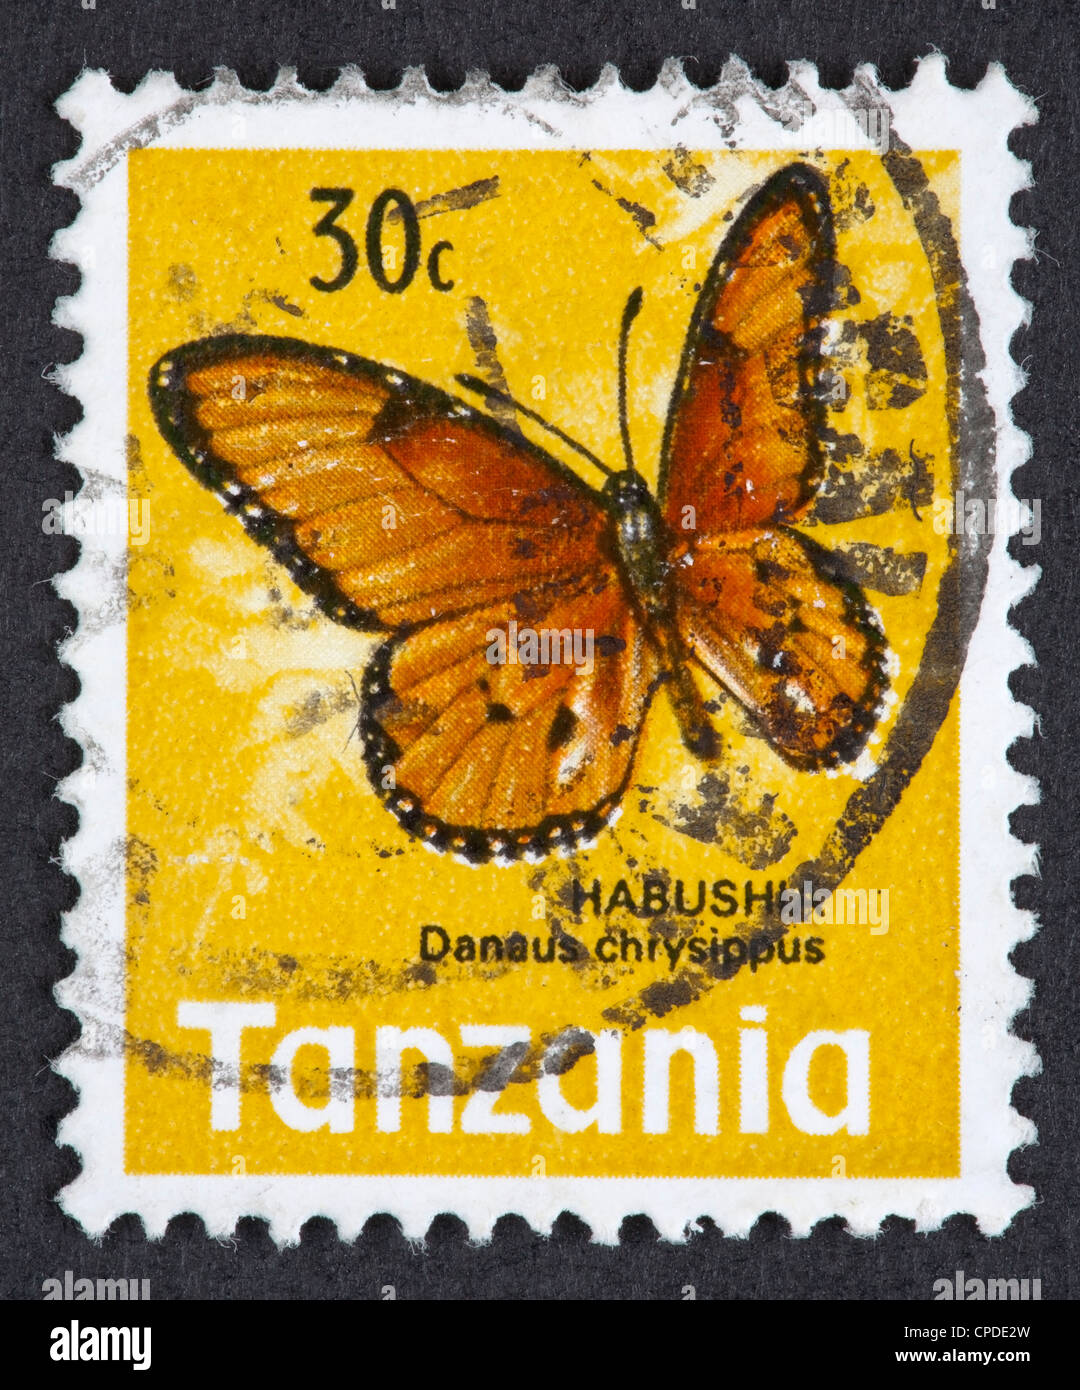 Tanzanian postage stamp - Stock Image